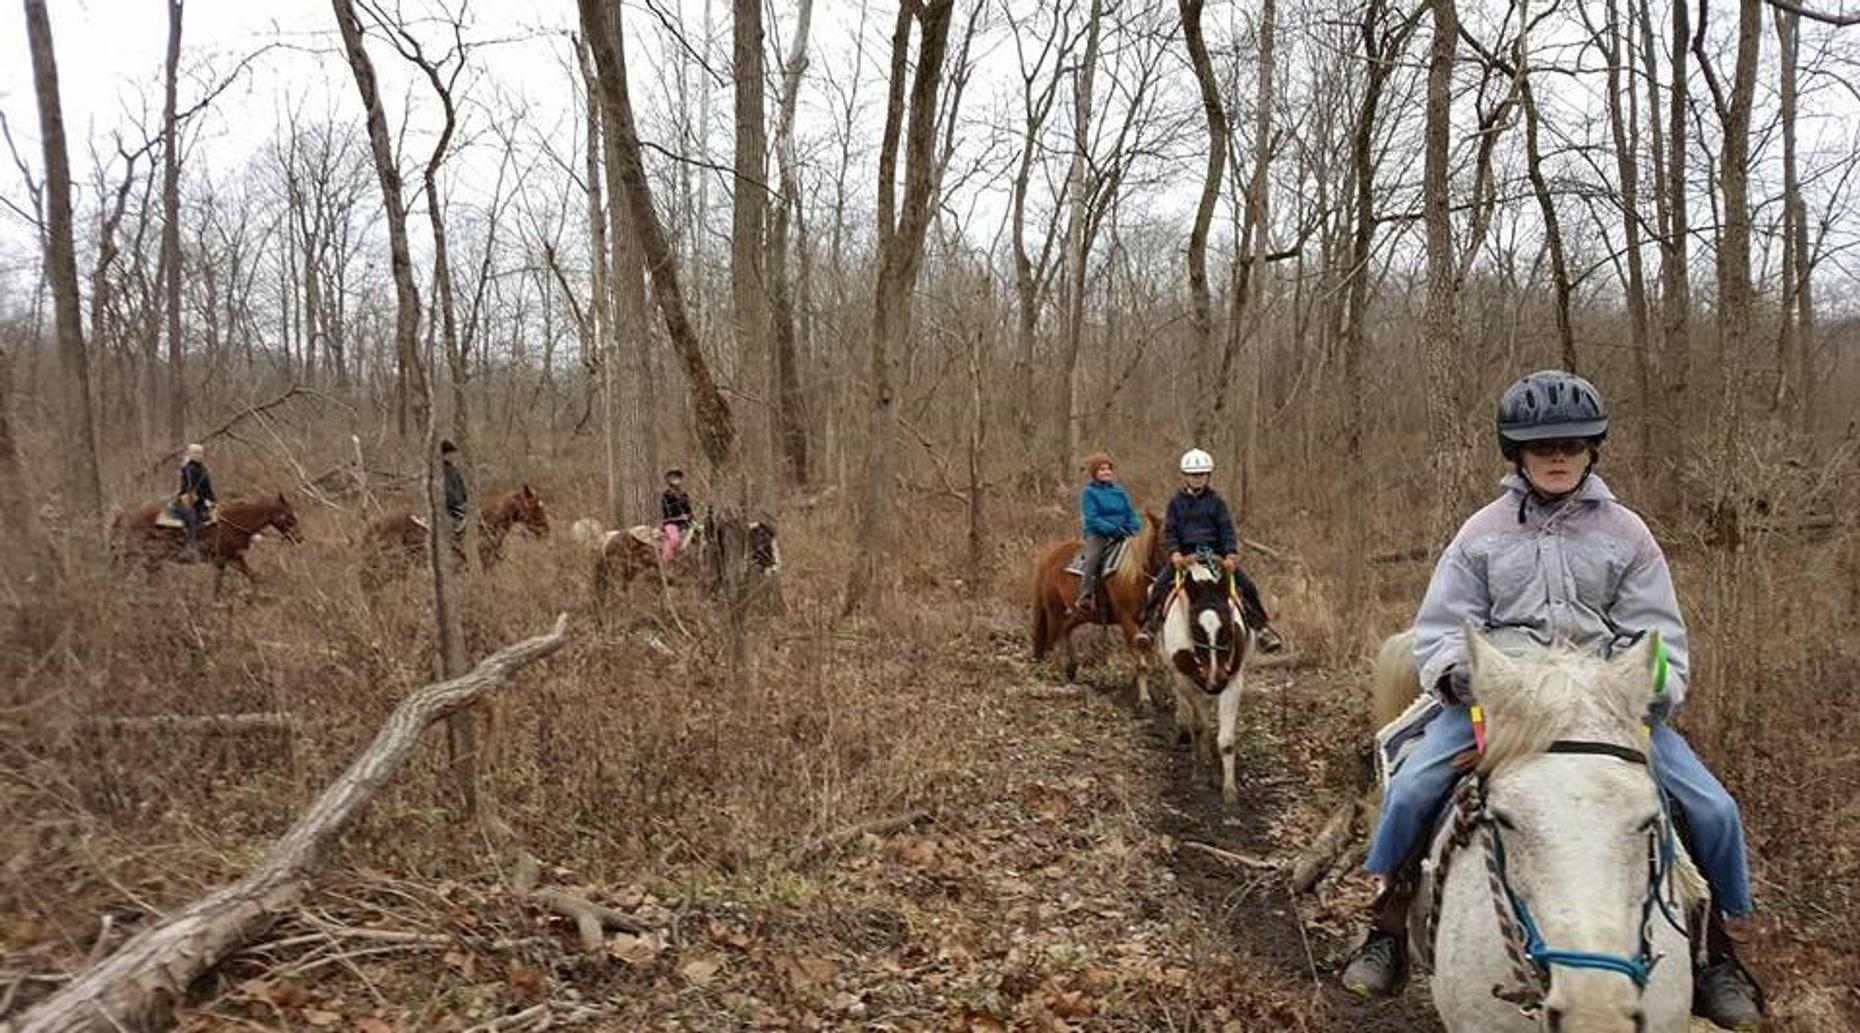 60 Minute Trail Ride in Hendricks County